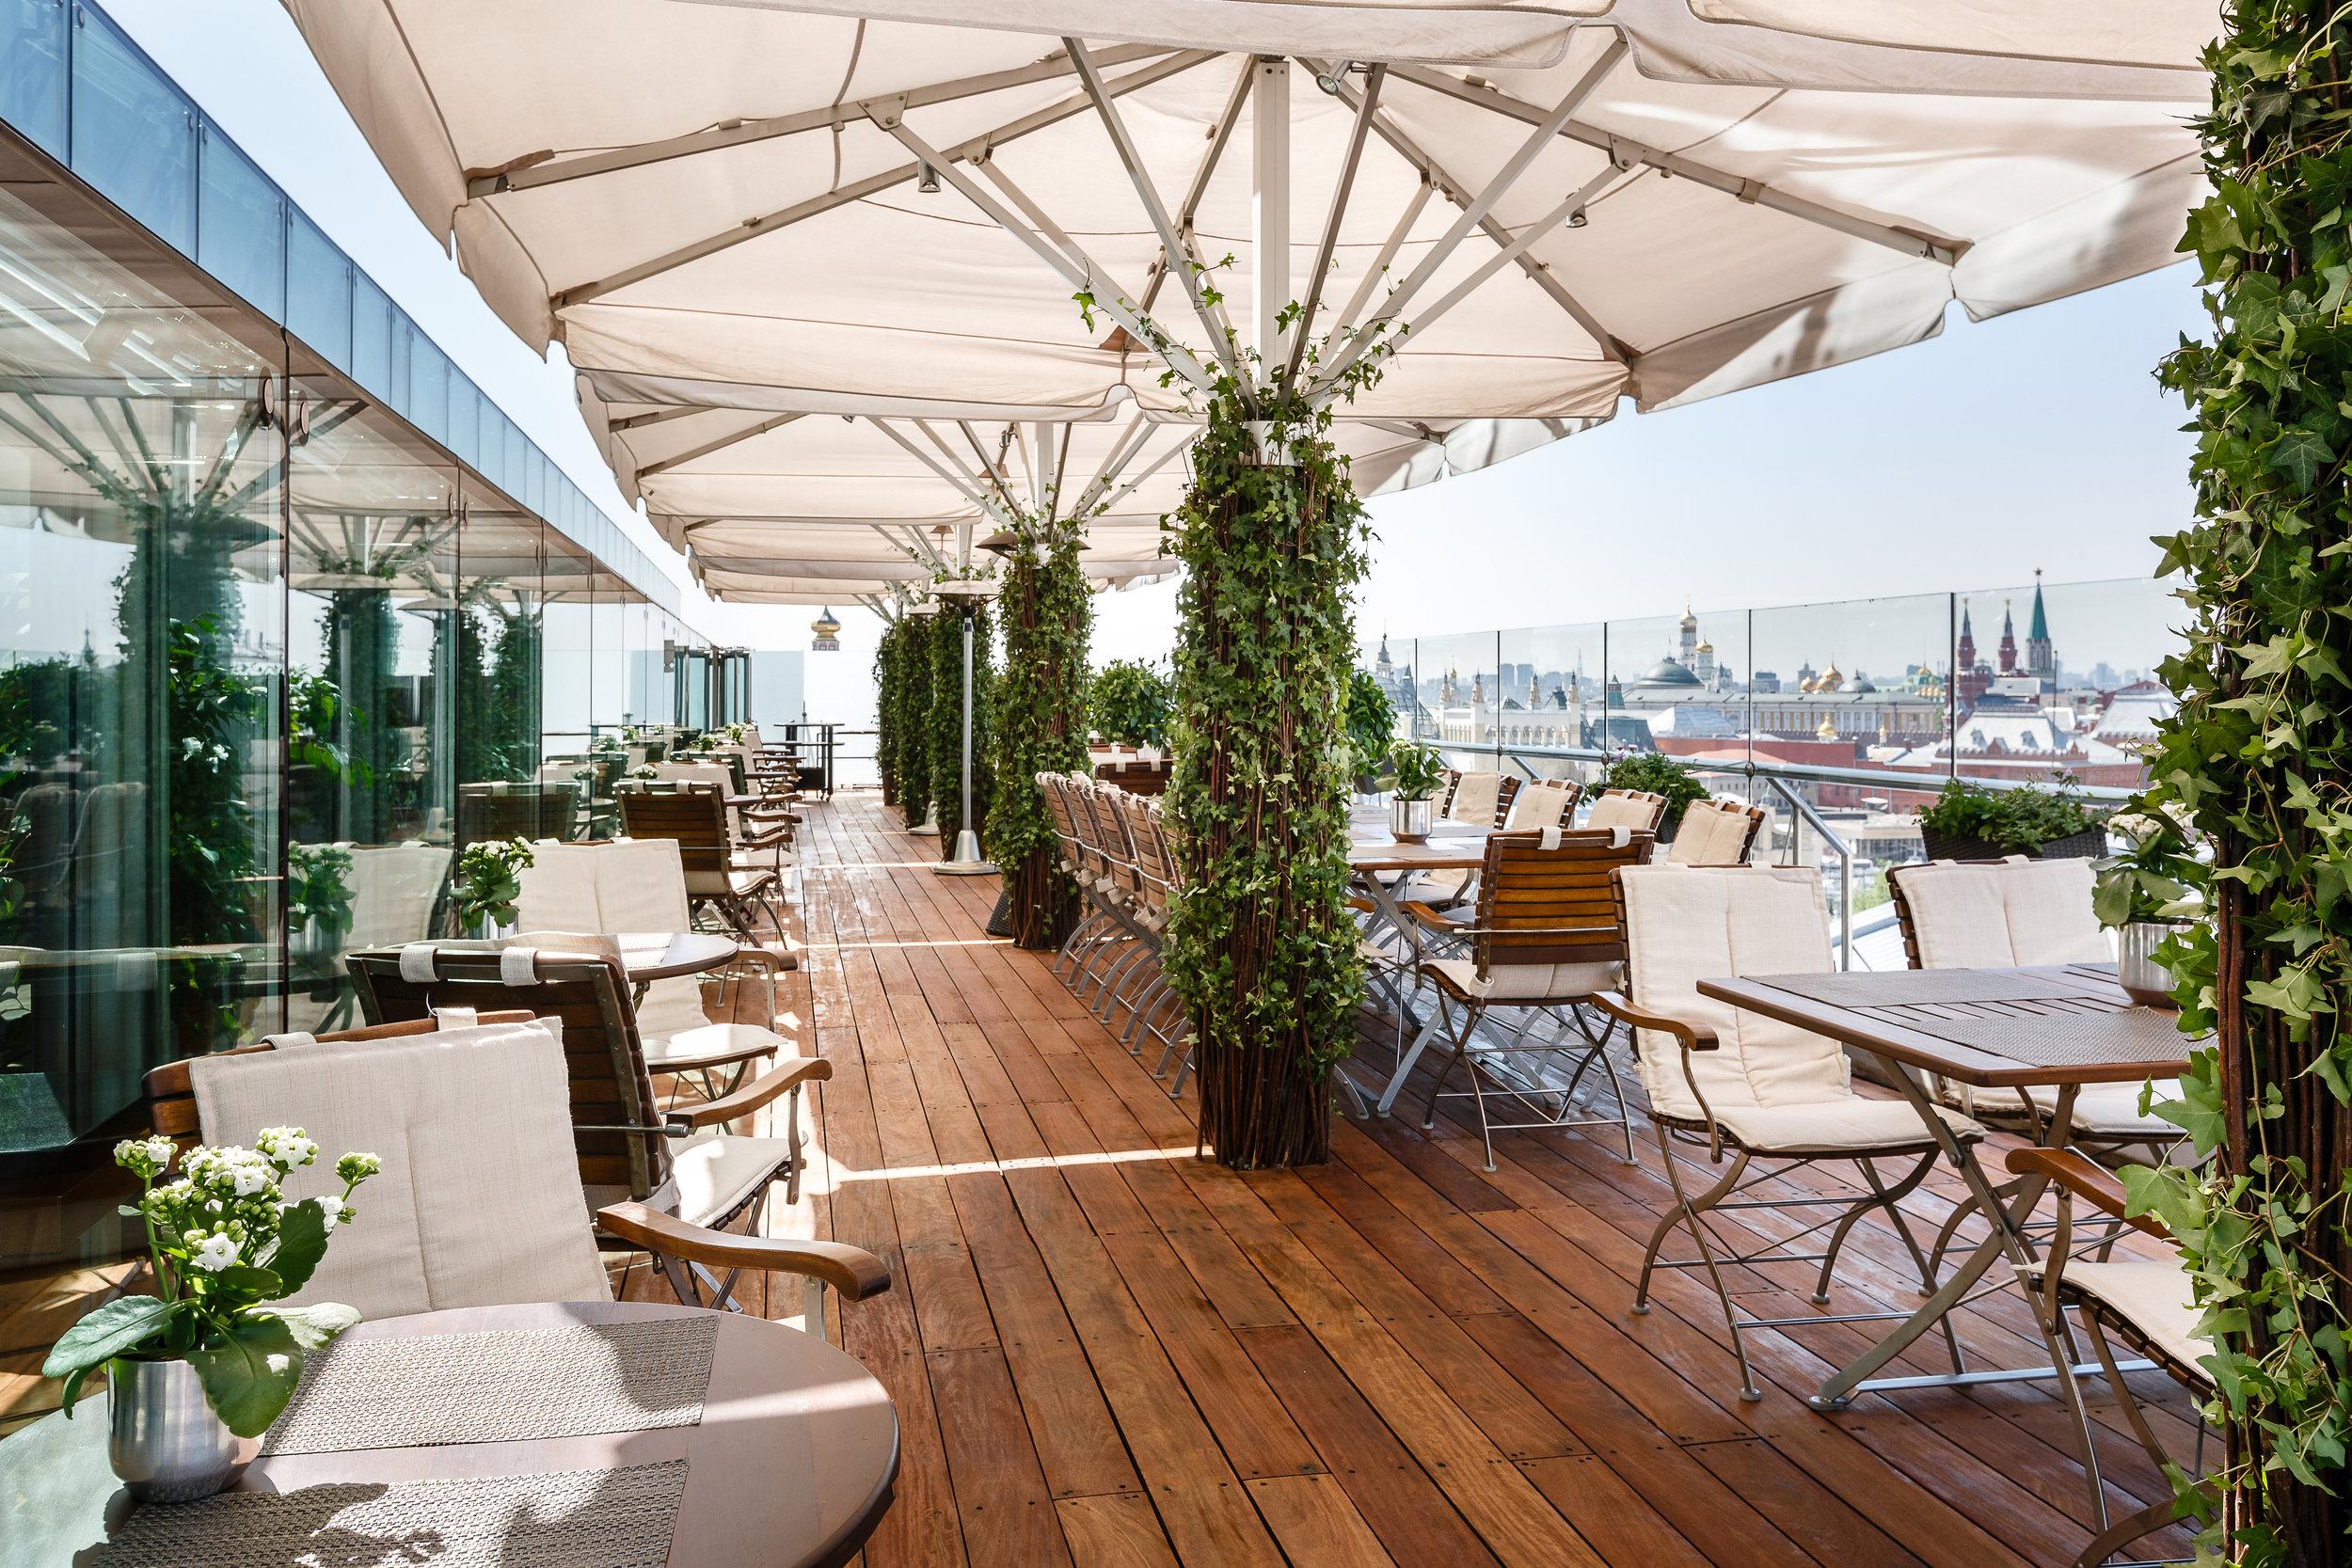 Ararat-Park-Hyatt-Moscow-Conservatory-Lounge-Bar-Terrace-Kremlim.jpg